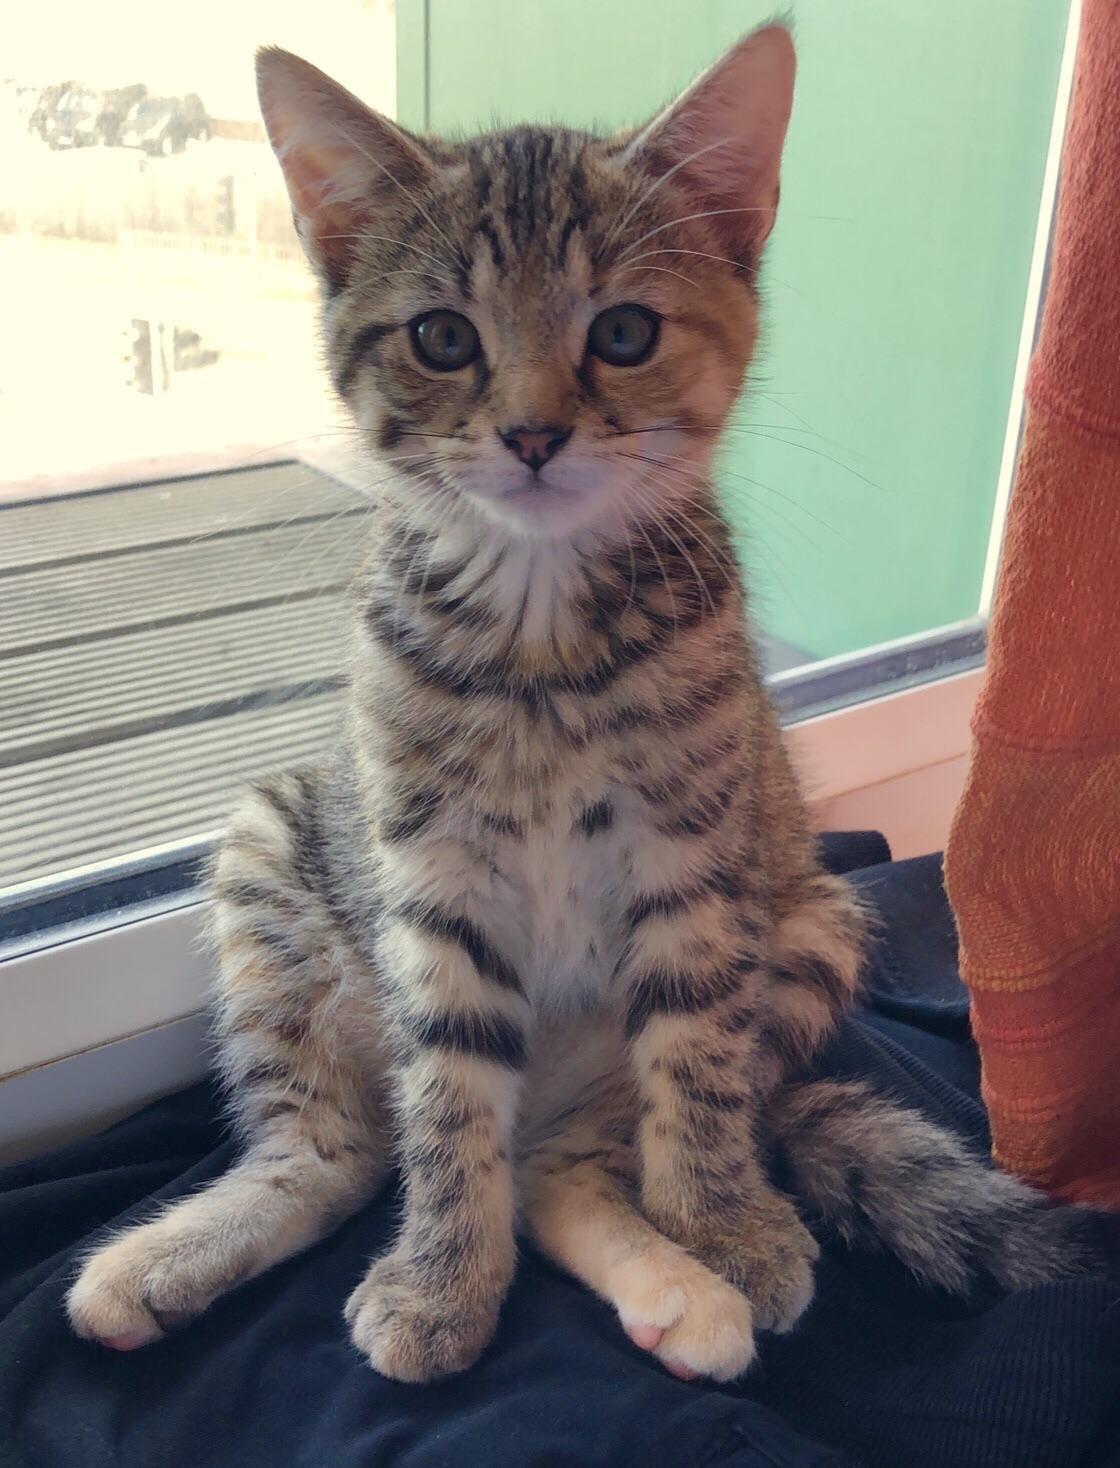 Chilling by the balcony. My 13 week old kitten; Tangerine